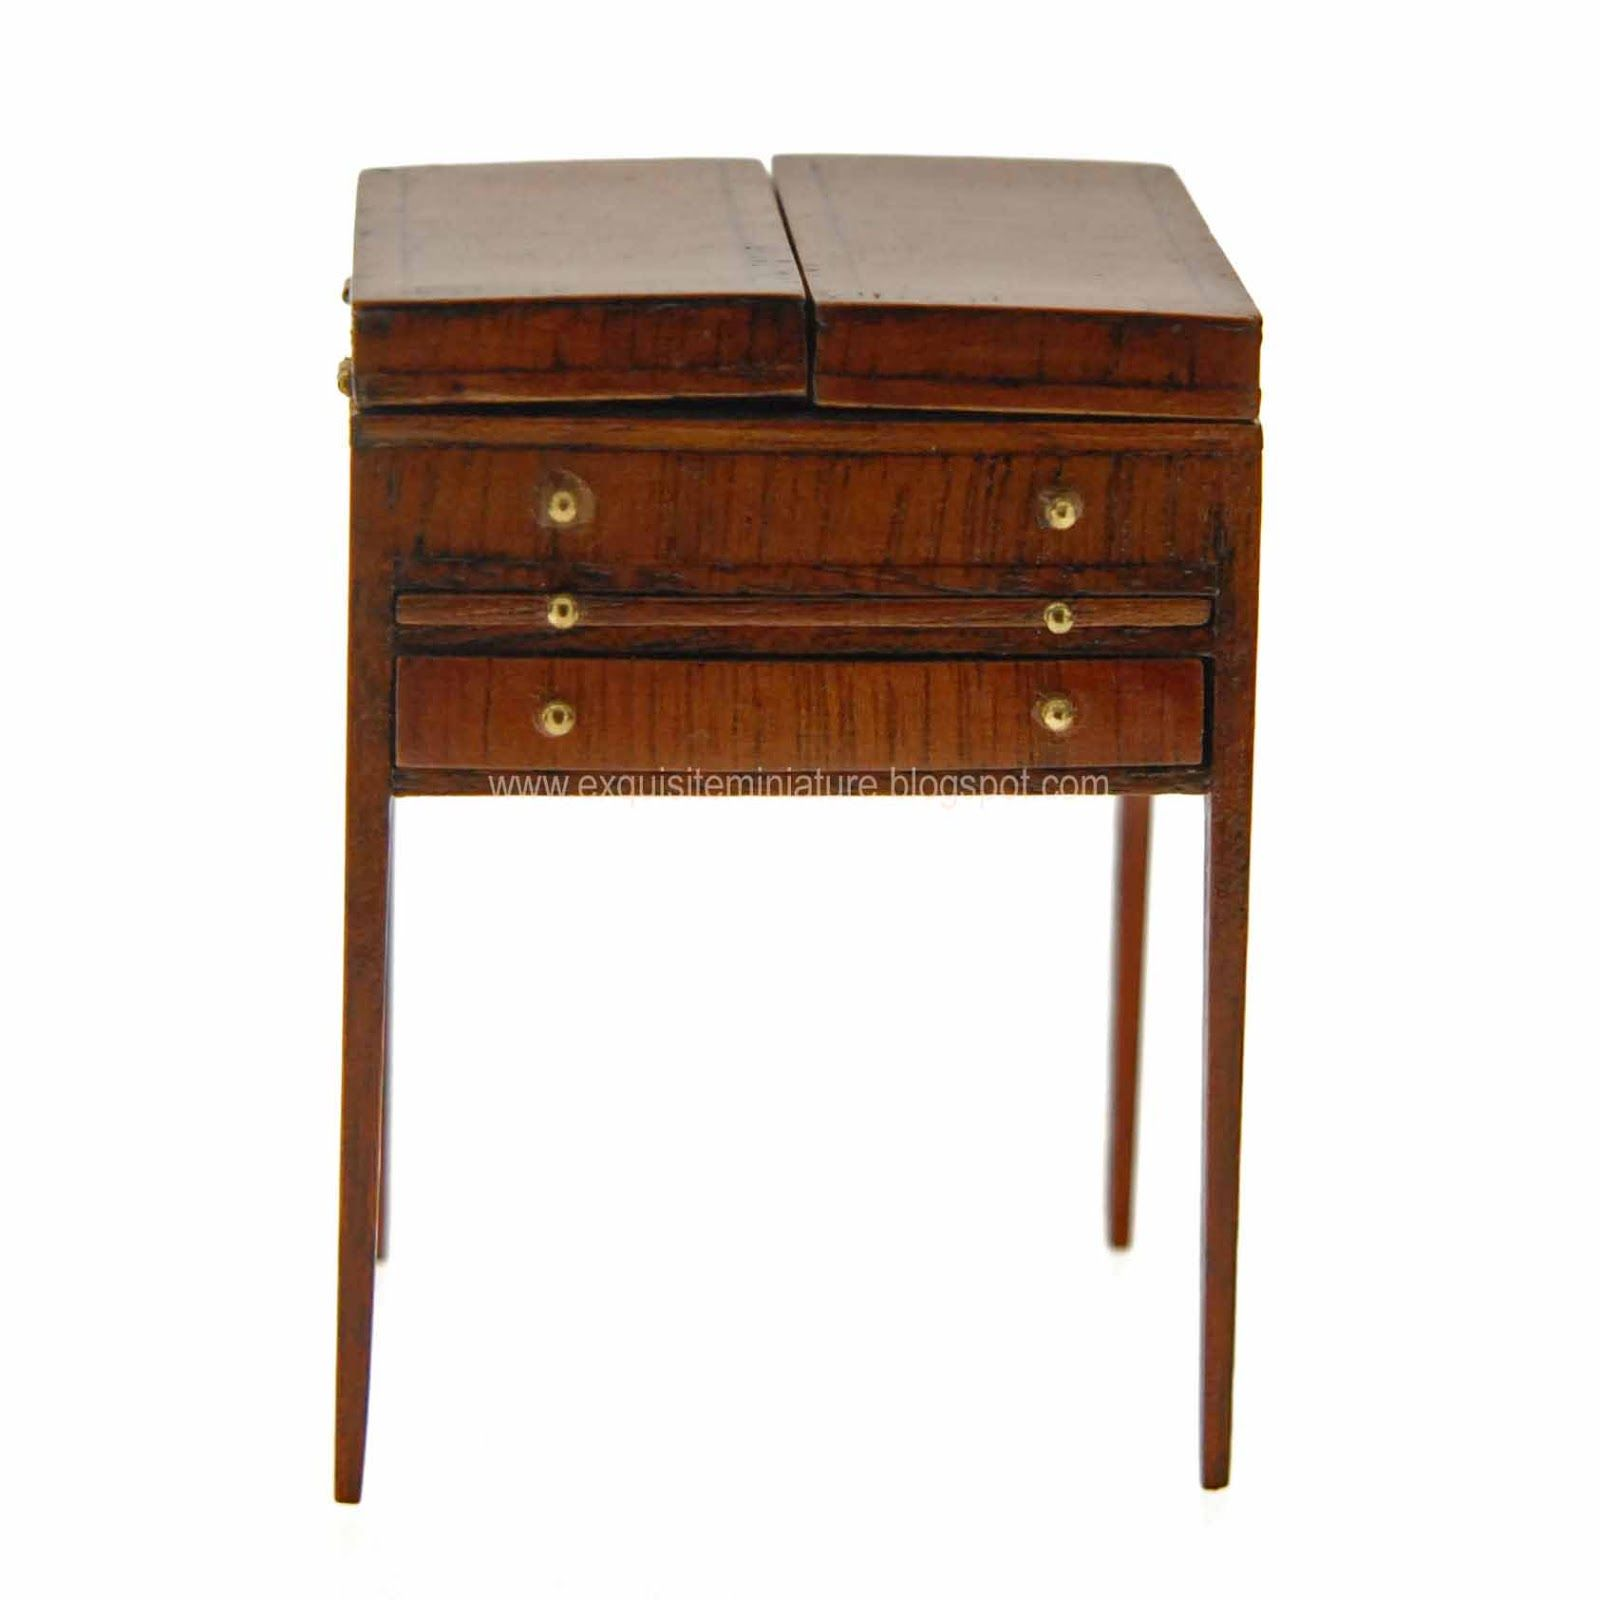 EXQUISITE MINIATURES: Fine Furniture......Dennis Jenvey (UK)